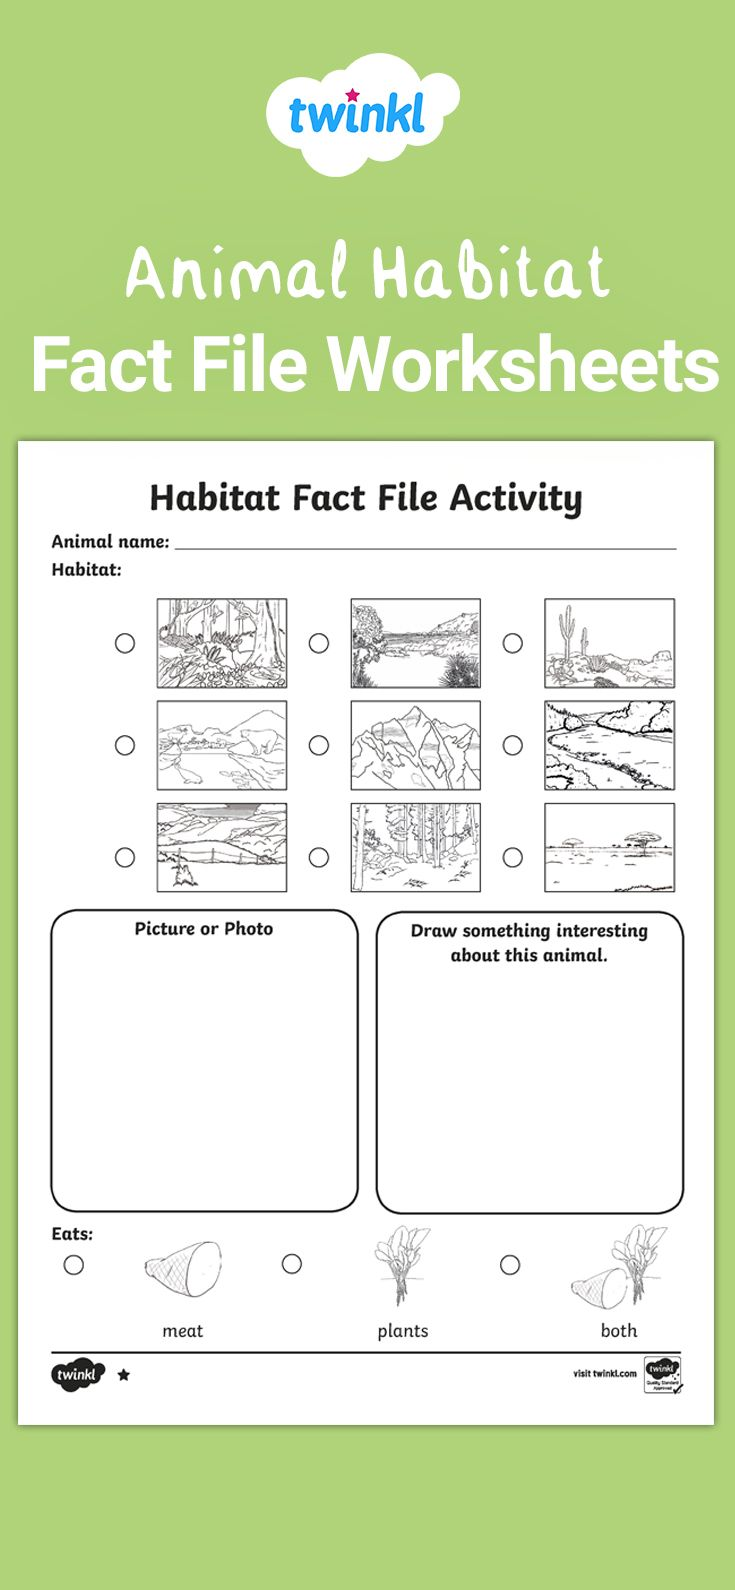 Animal Habitat Differentiated Fact File Worksheets In 2021 Animal Habitats Habitats Teaching Science [ 1590 x 735 Pixel ]